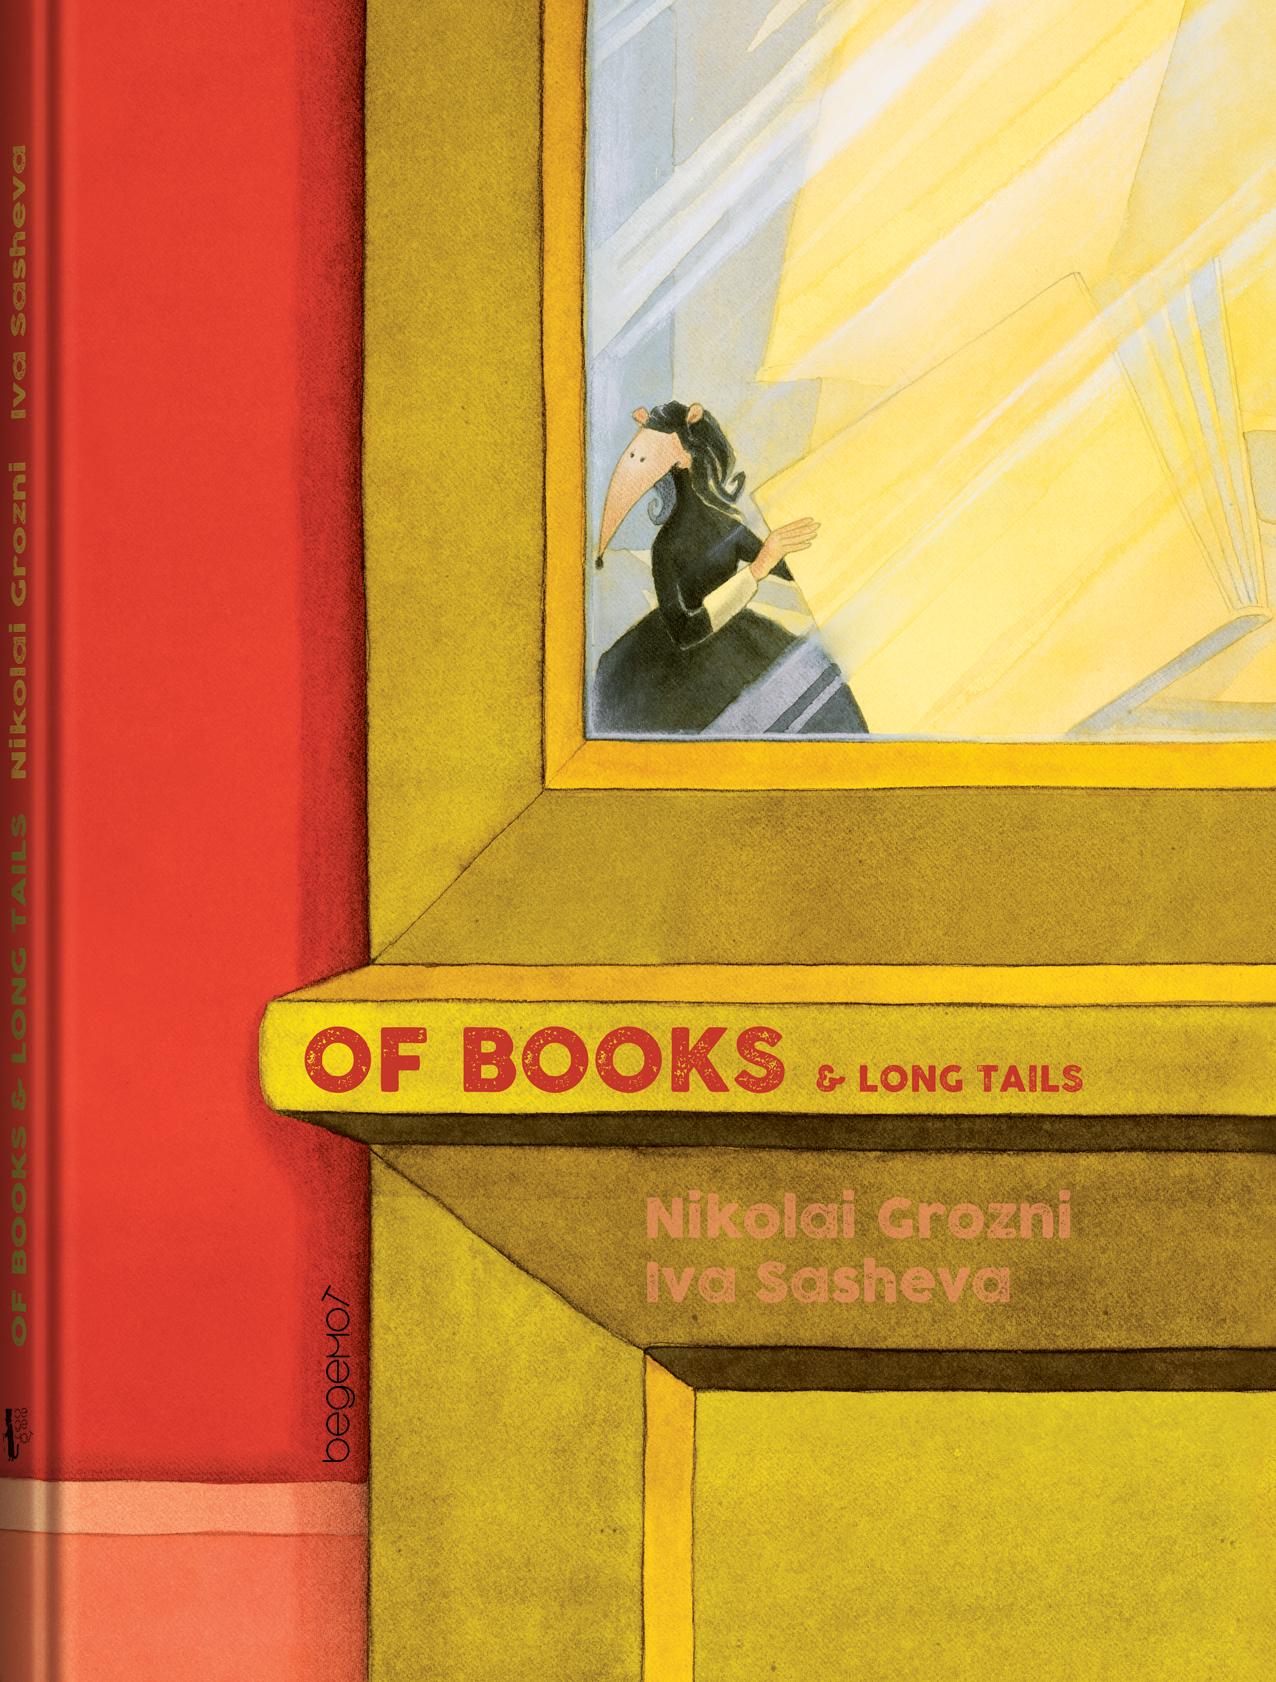 OfBooks&LongTails